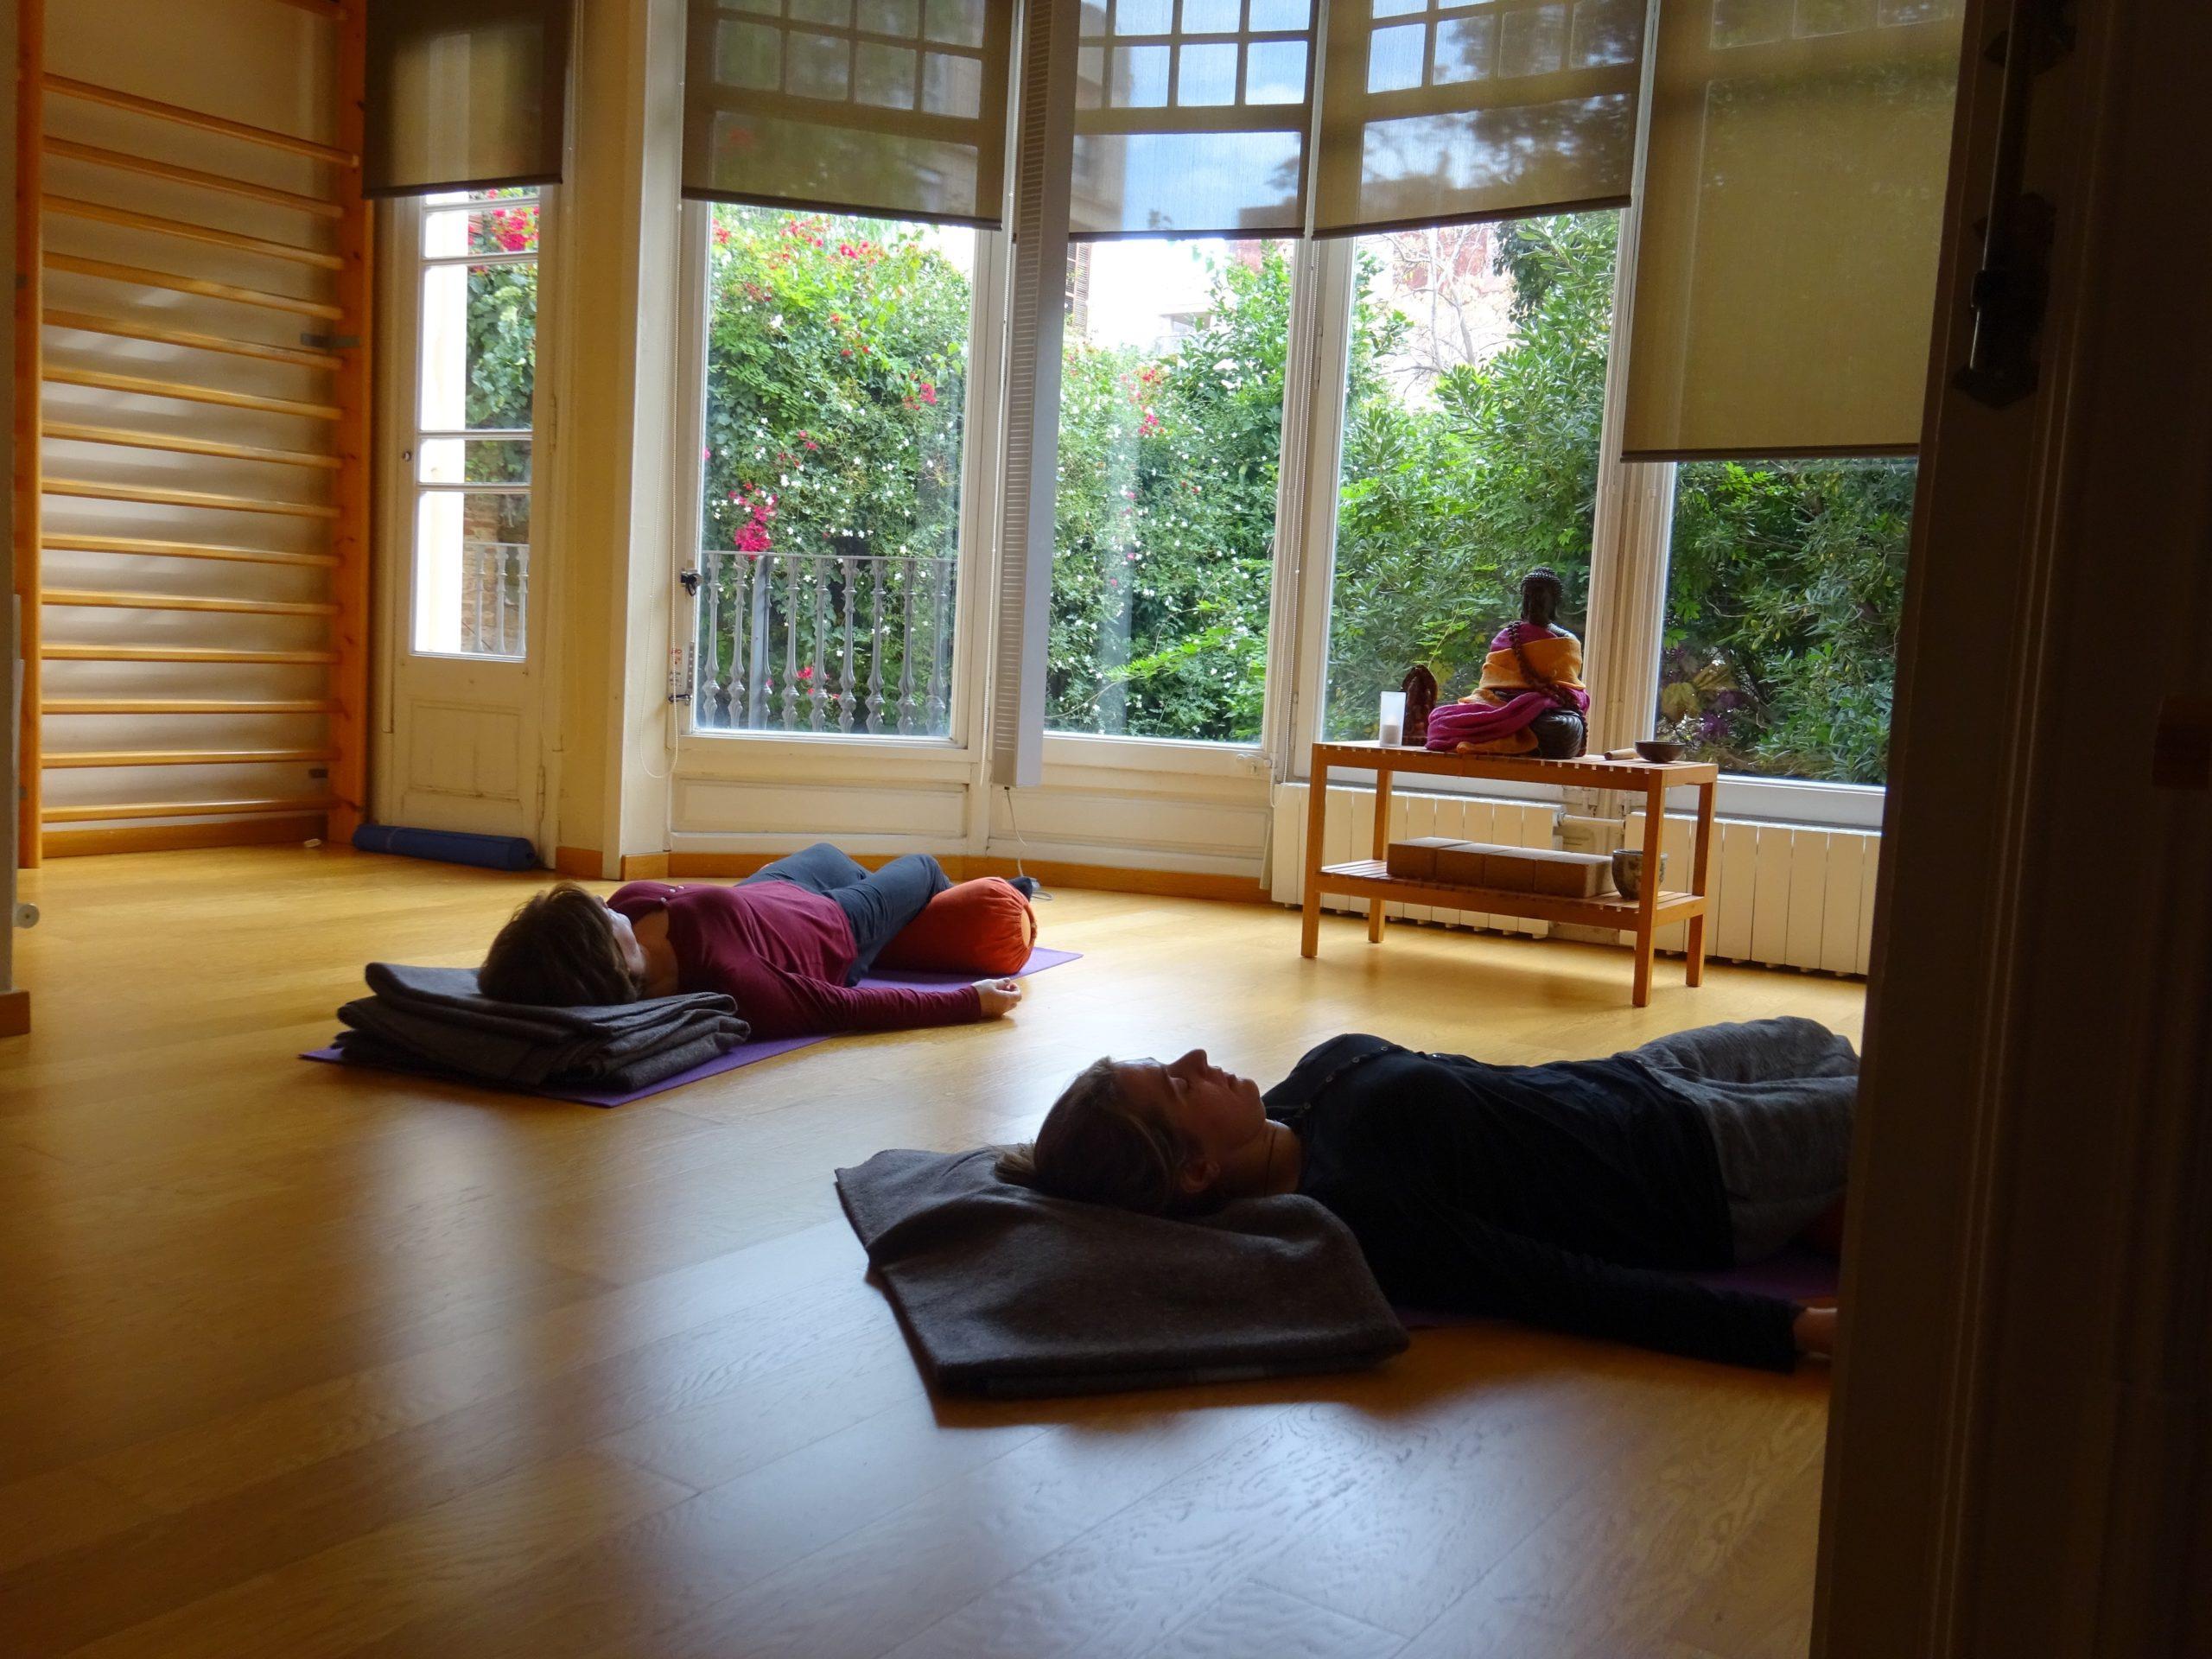 Formacion Certificada Instructoras Yoga Nidra Mindfulness Darshan Barcelona